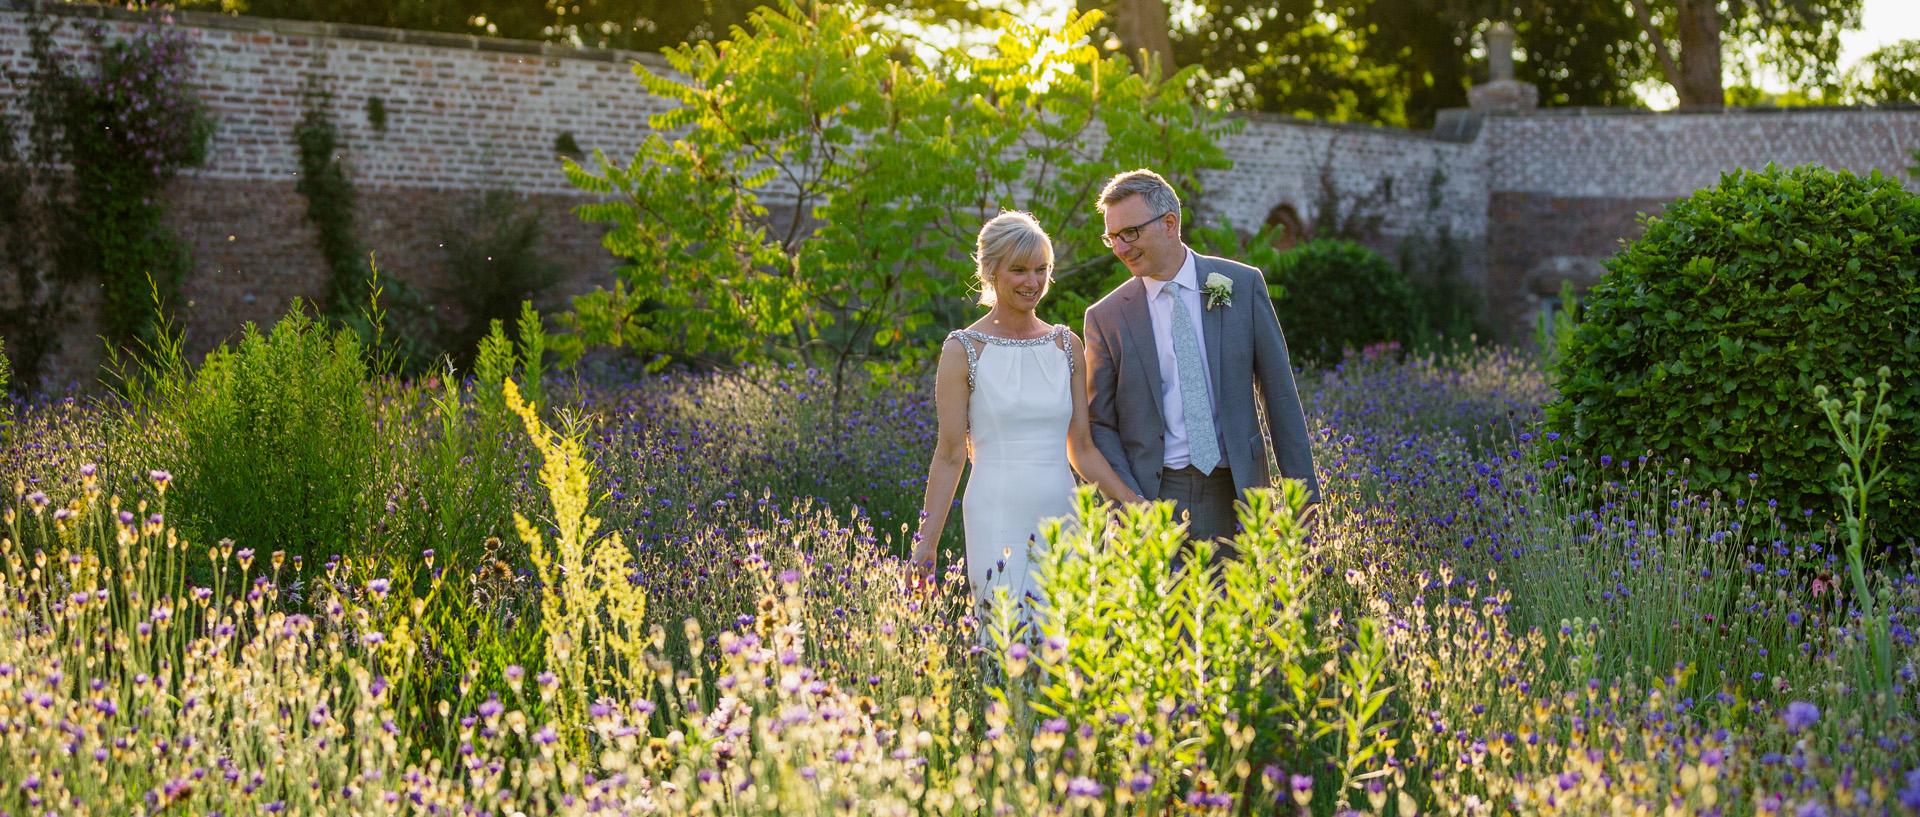 Paula & David - An English Country Wedding